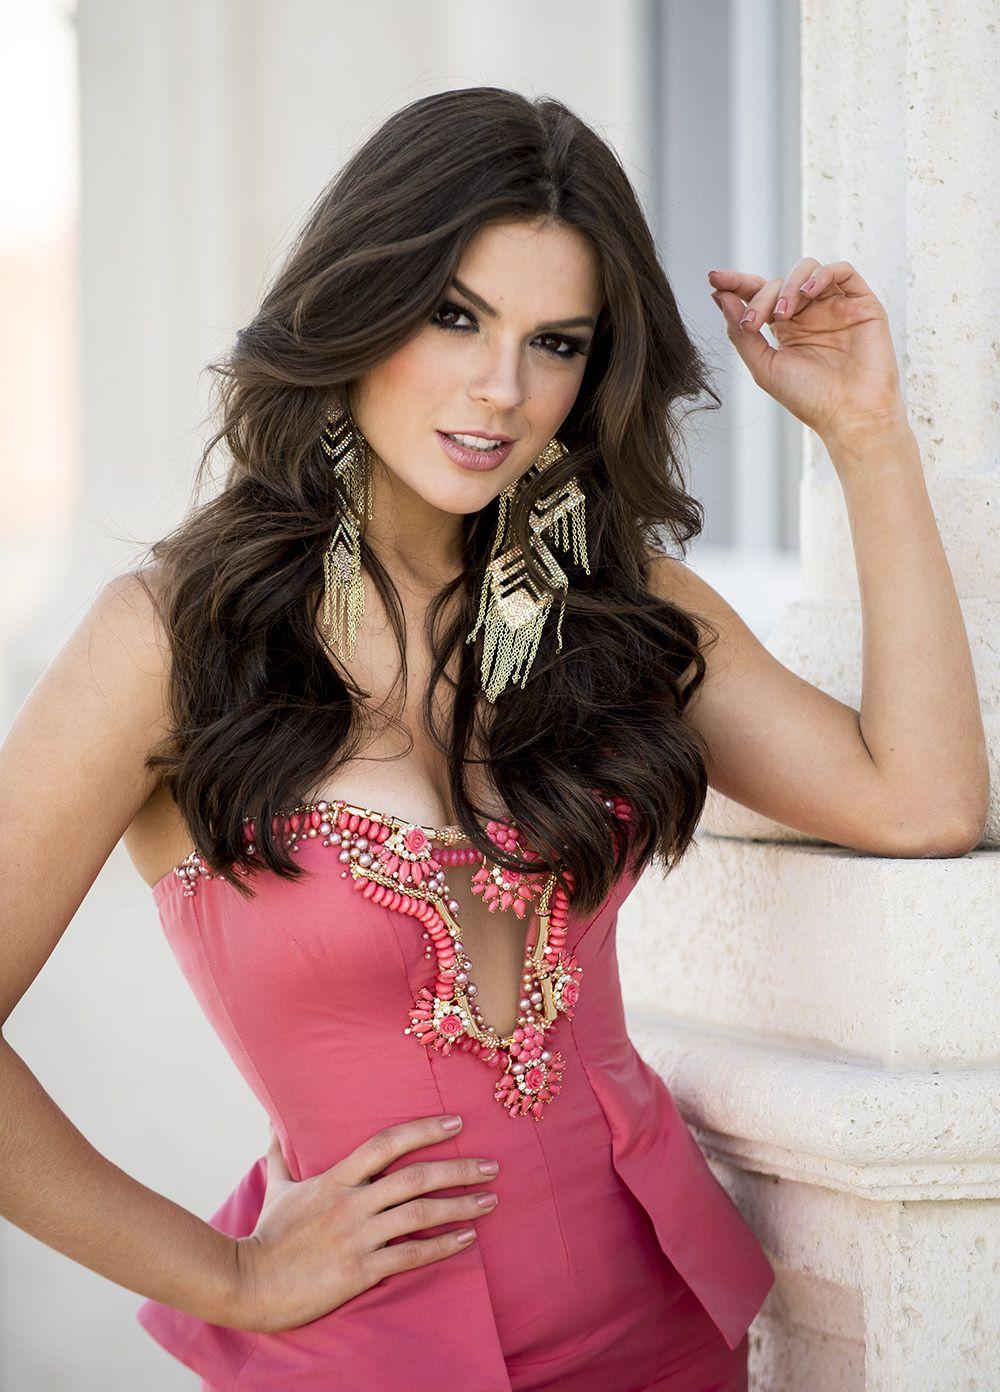 melissa gurgel, miss brasil 2014. P2mvxsdl